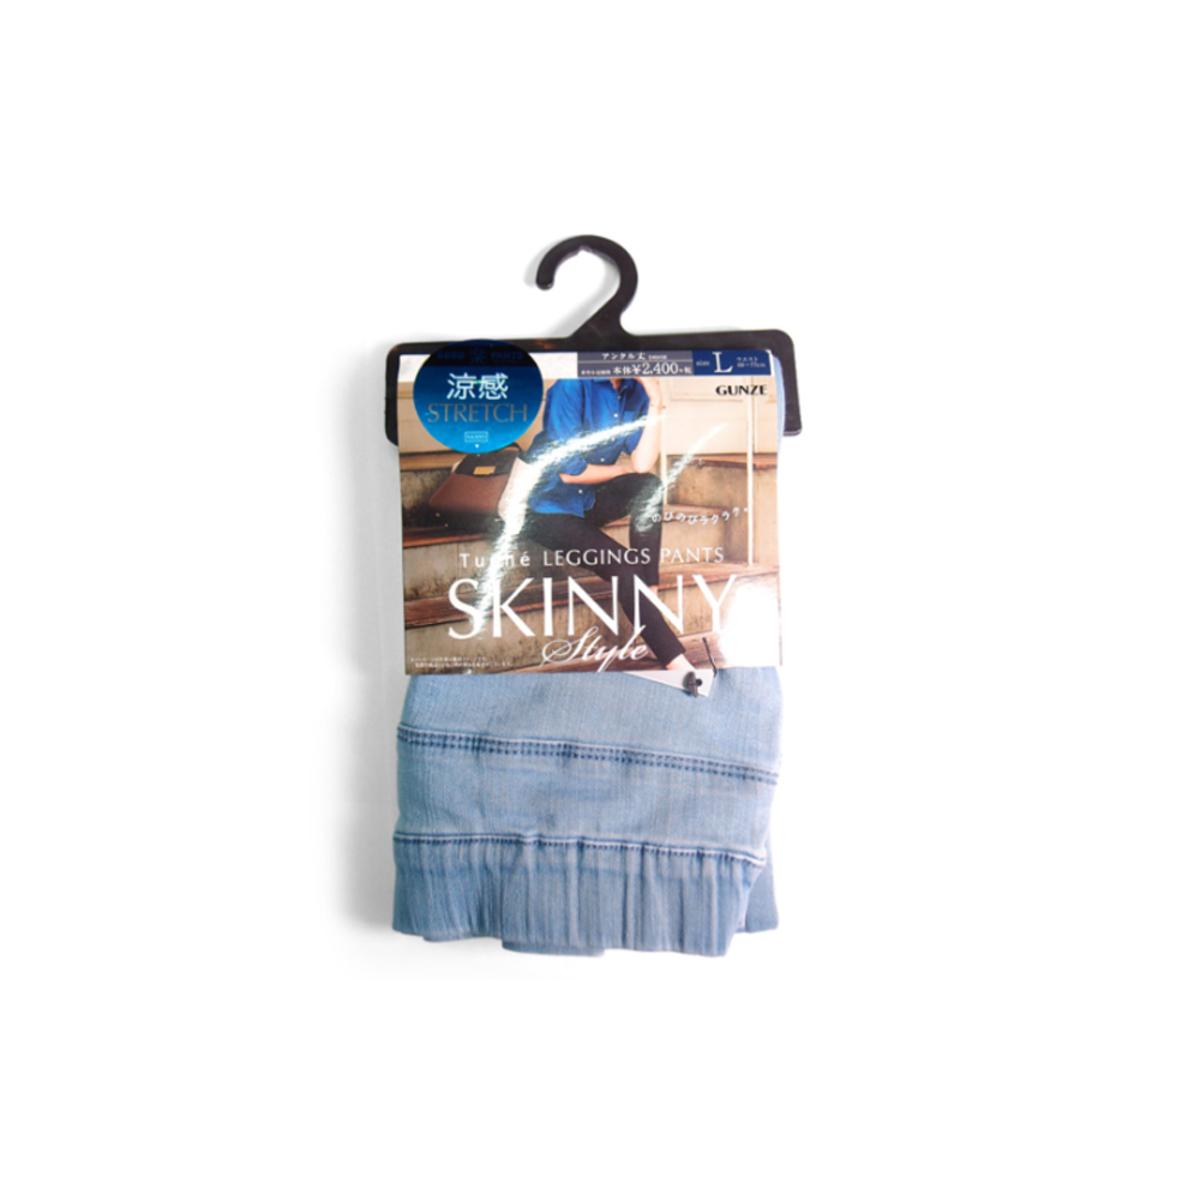 GUNZE Tuche Denim Leggings Pants Skinny - Blue 郡是 高彈性涼感牛仔褲布 TZH508 83L,Color:459淺藍色 L(4547531534957)